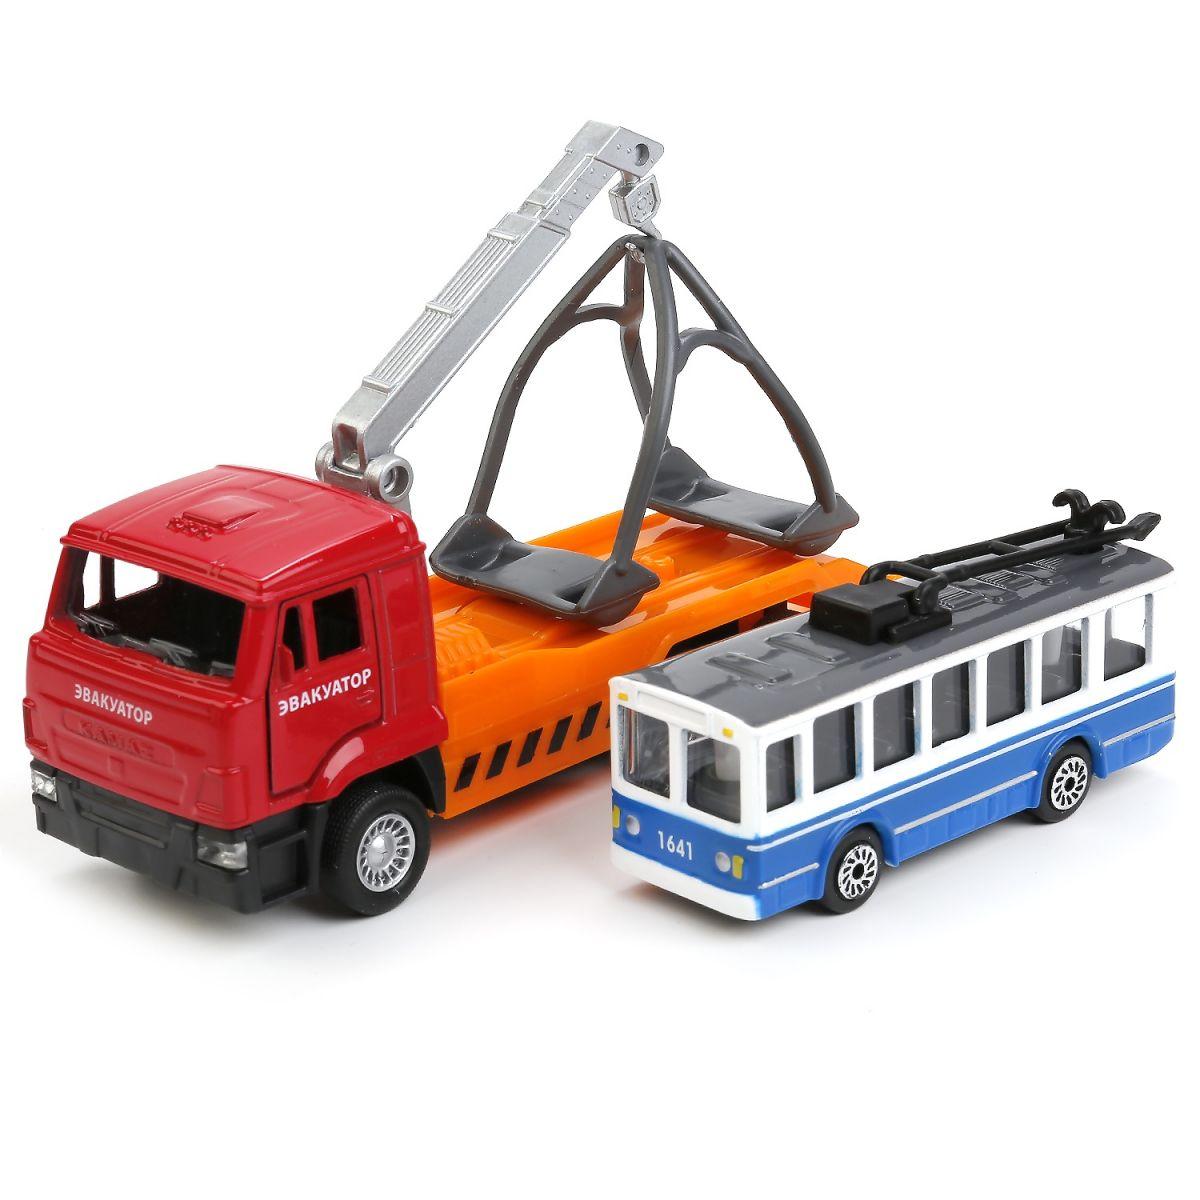 Эвакуатор КамАЗ 12 см и троллейбус 7,5 см фото